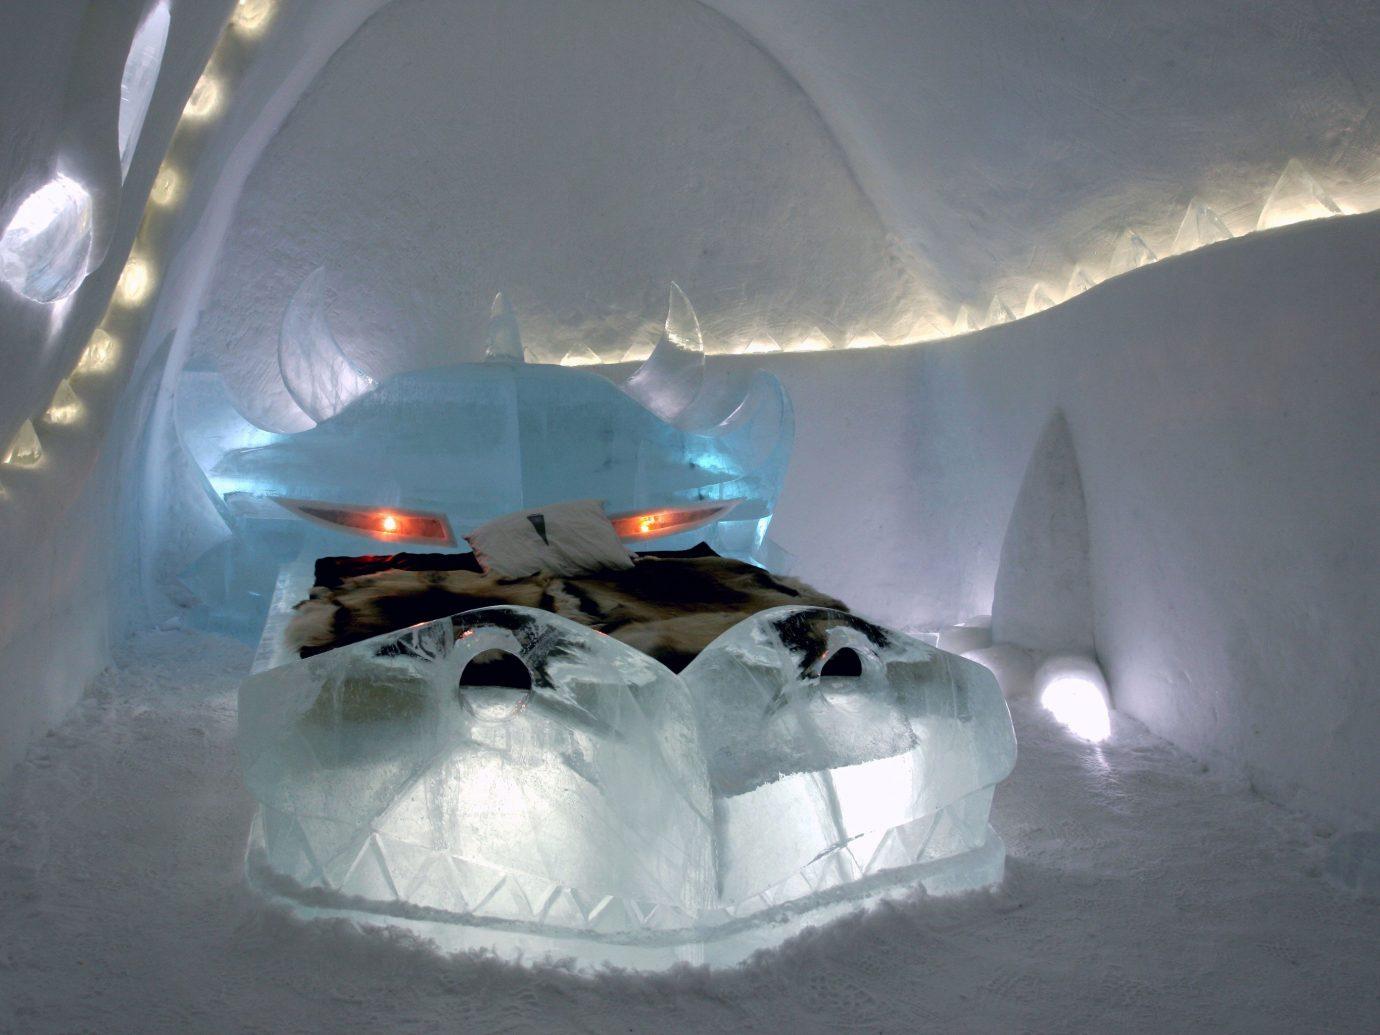 Trip Ideas snow weather light ice freezing igloo ice hotel screenshot blizzard melting